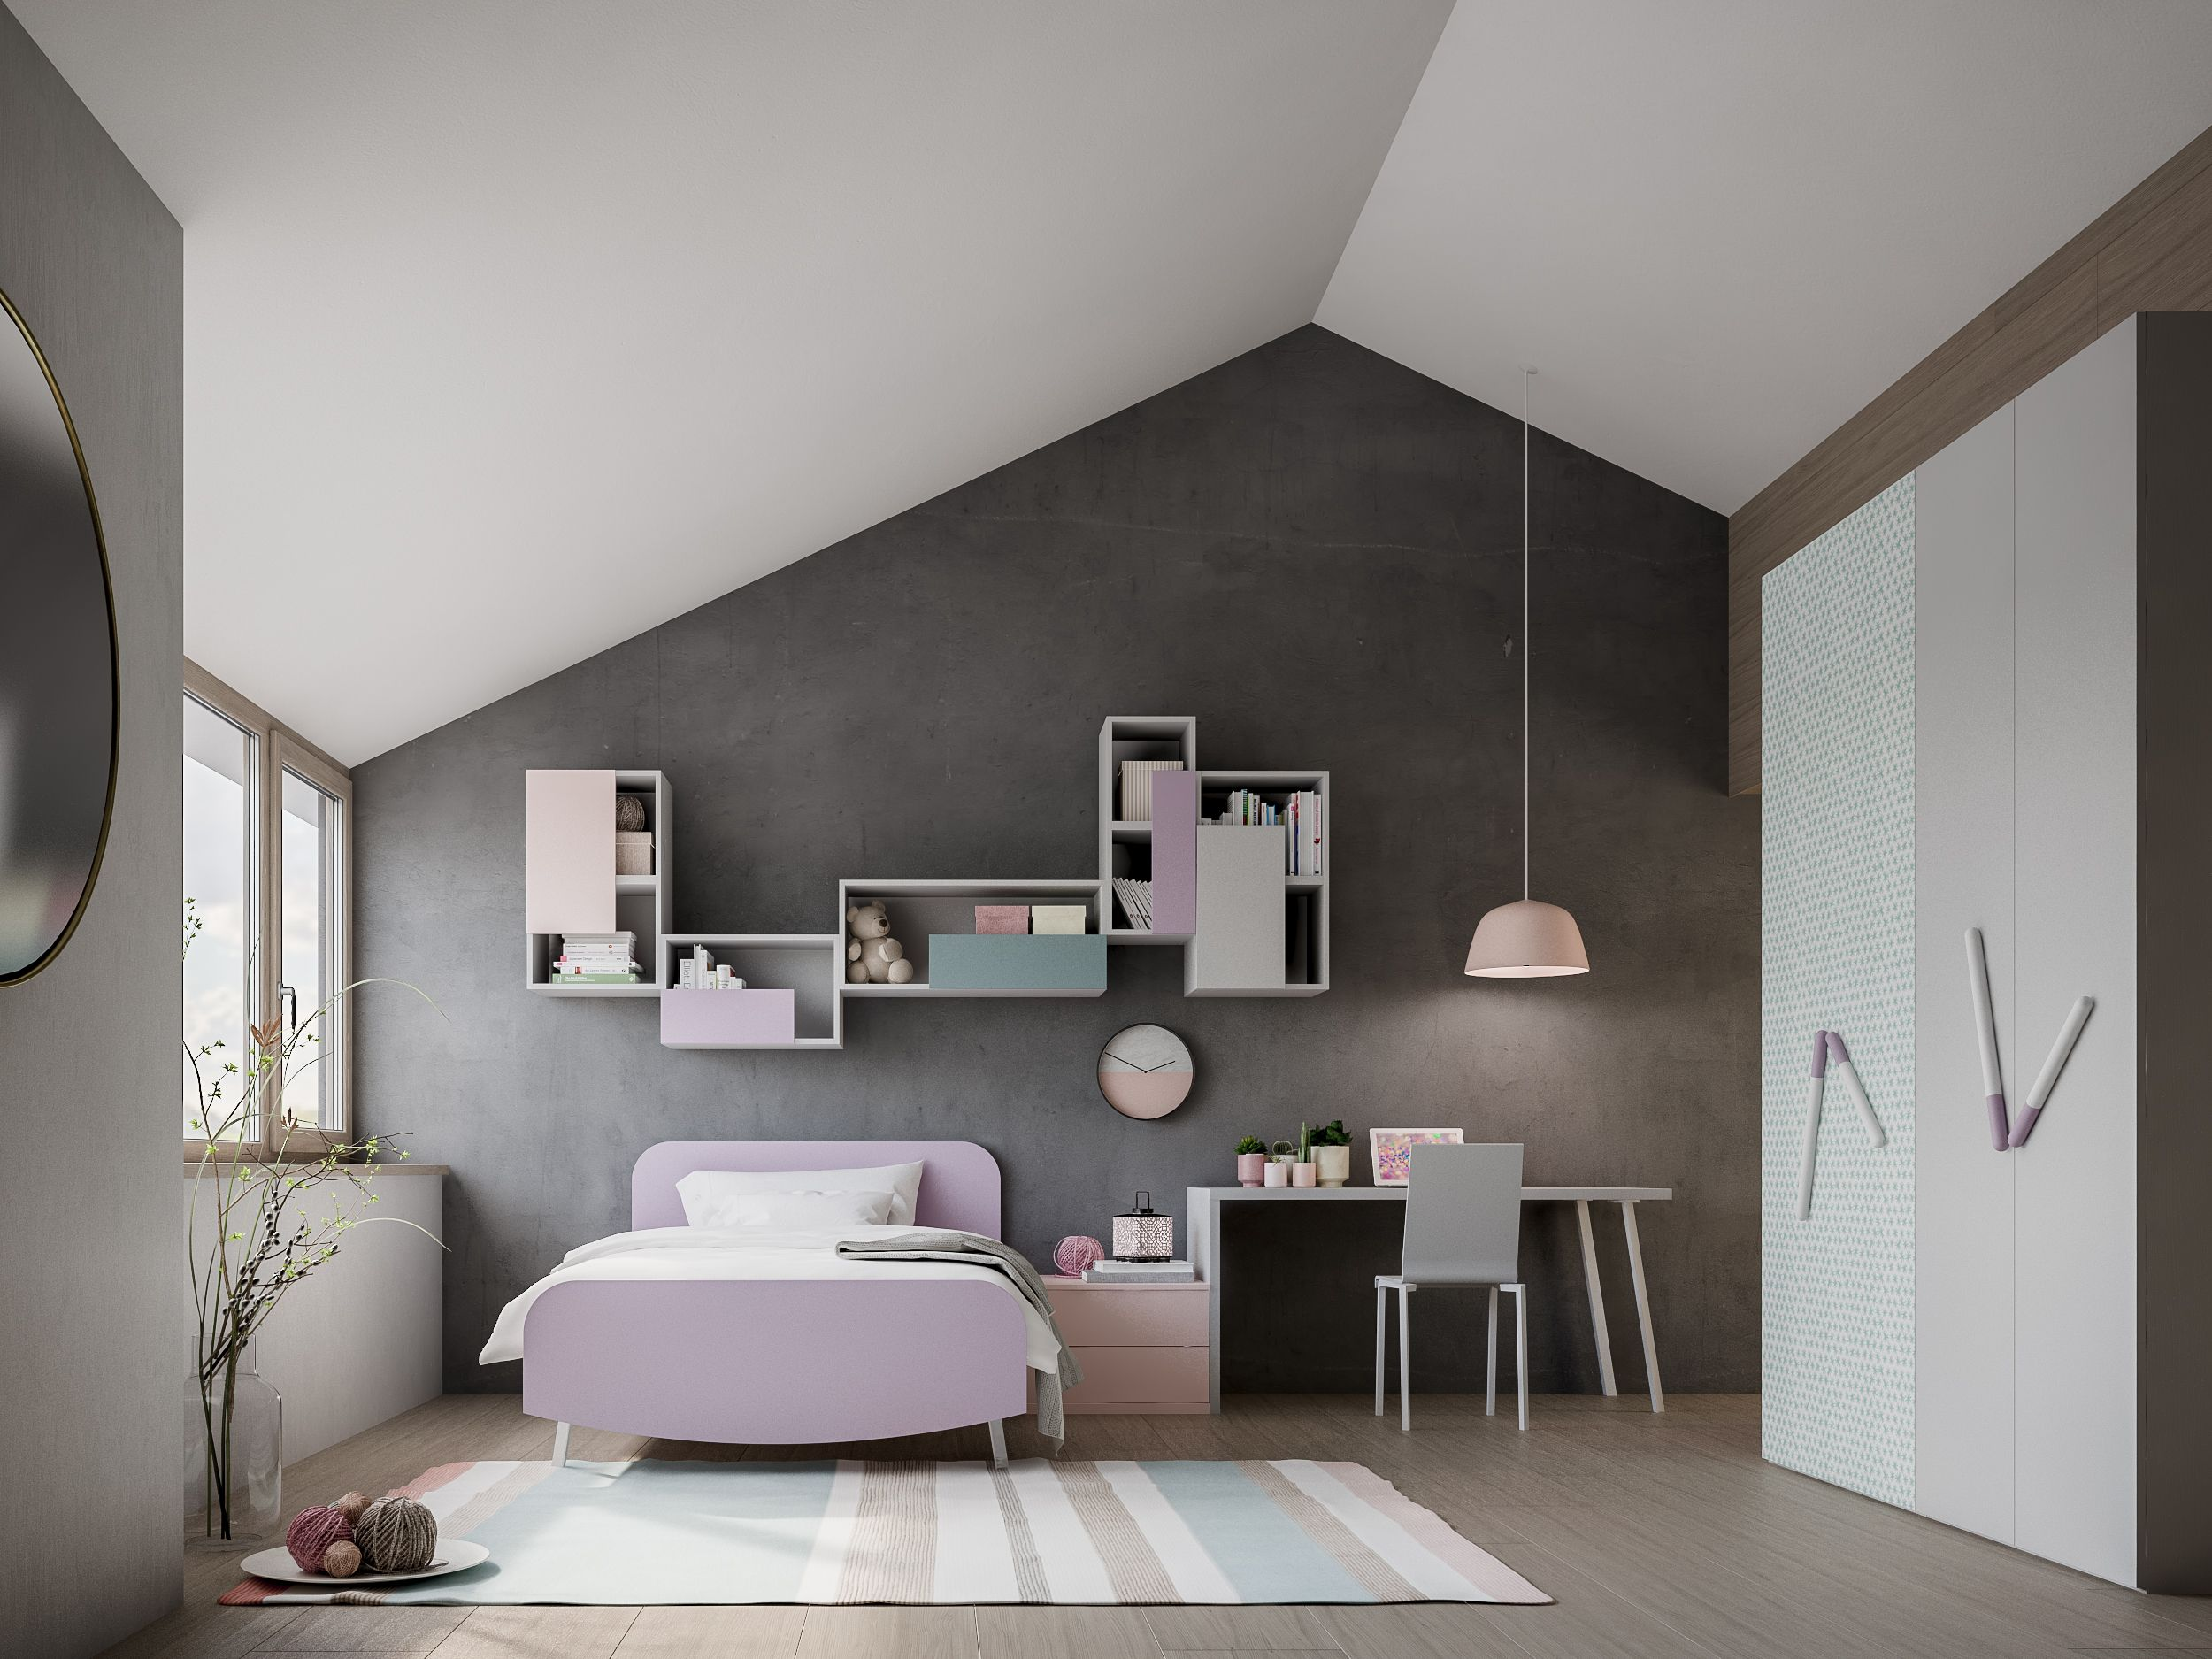 Nardi kinderkamer jeugdkamer italiaans design collectie